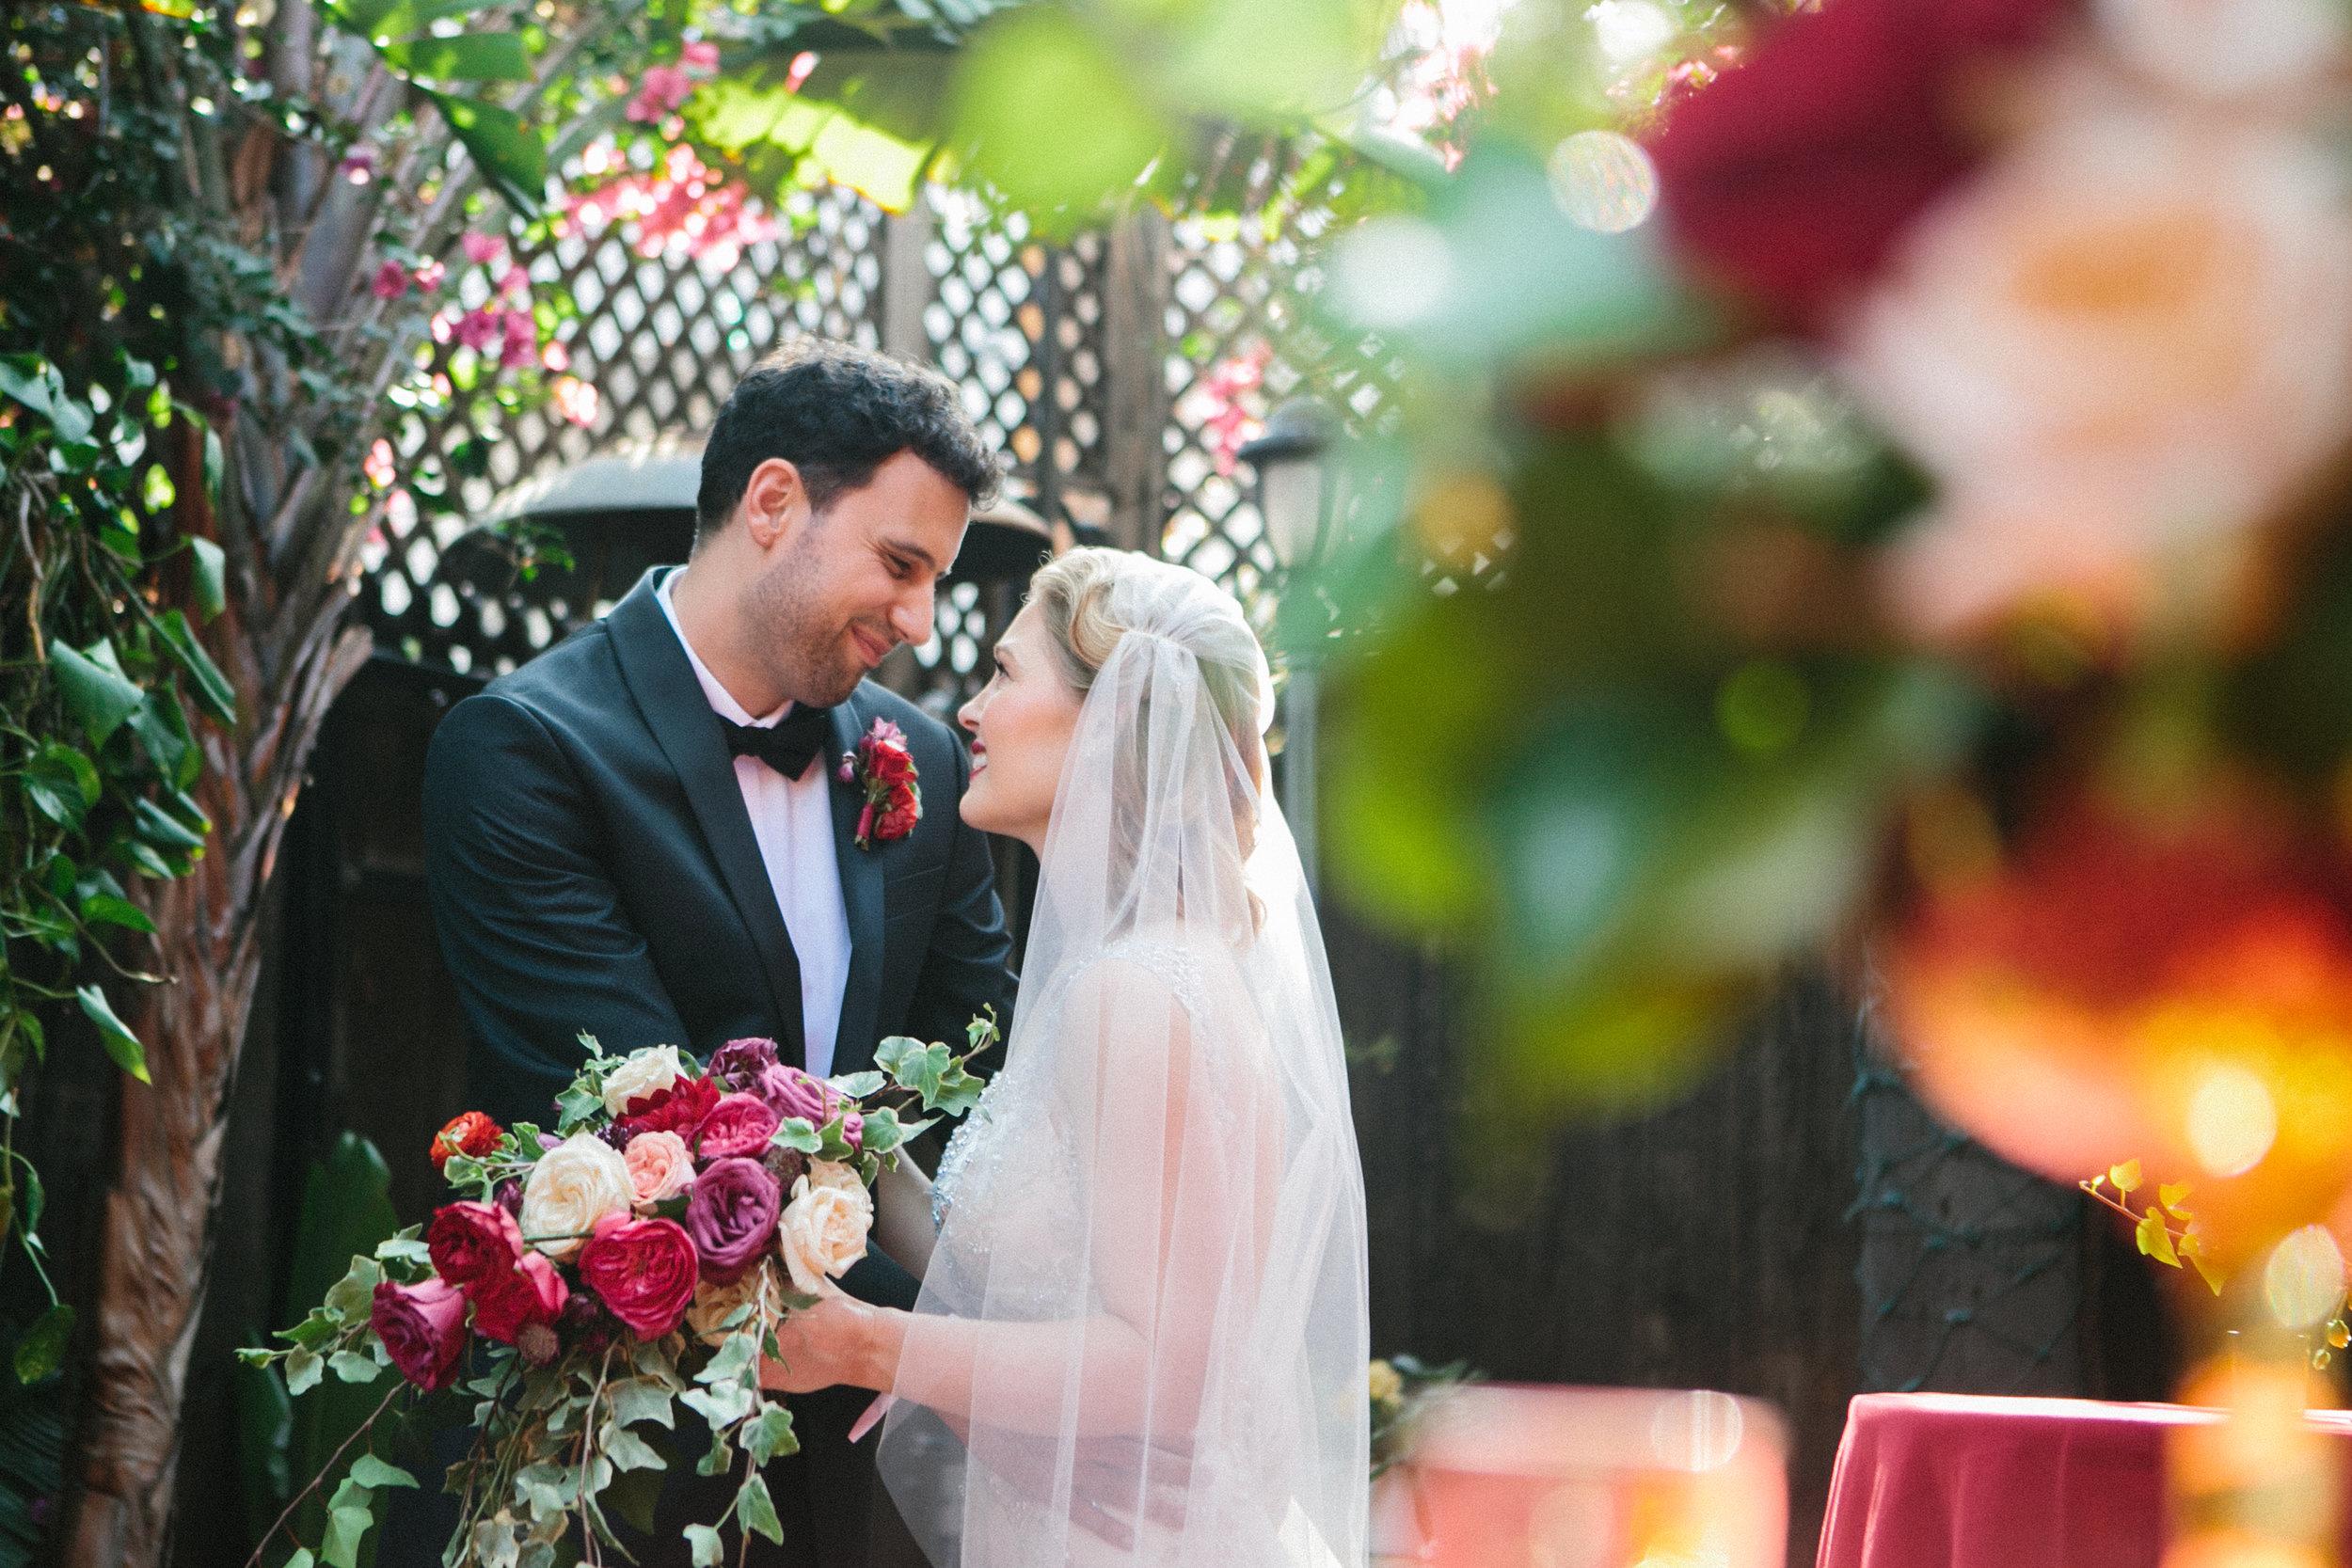 Allison+&+Easton+Wedding_0473.jpg